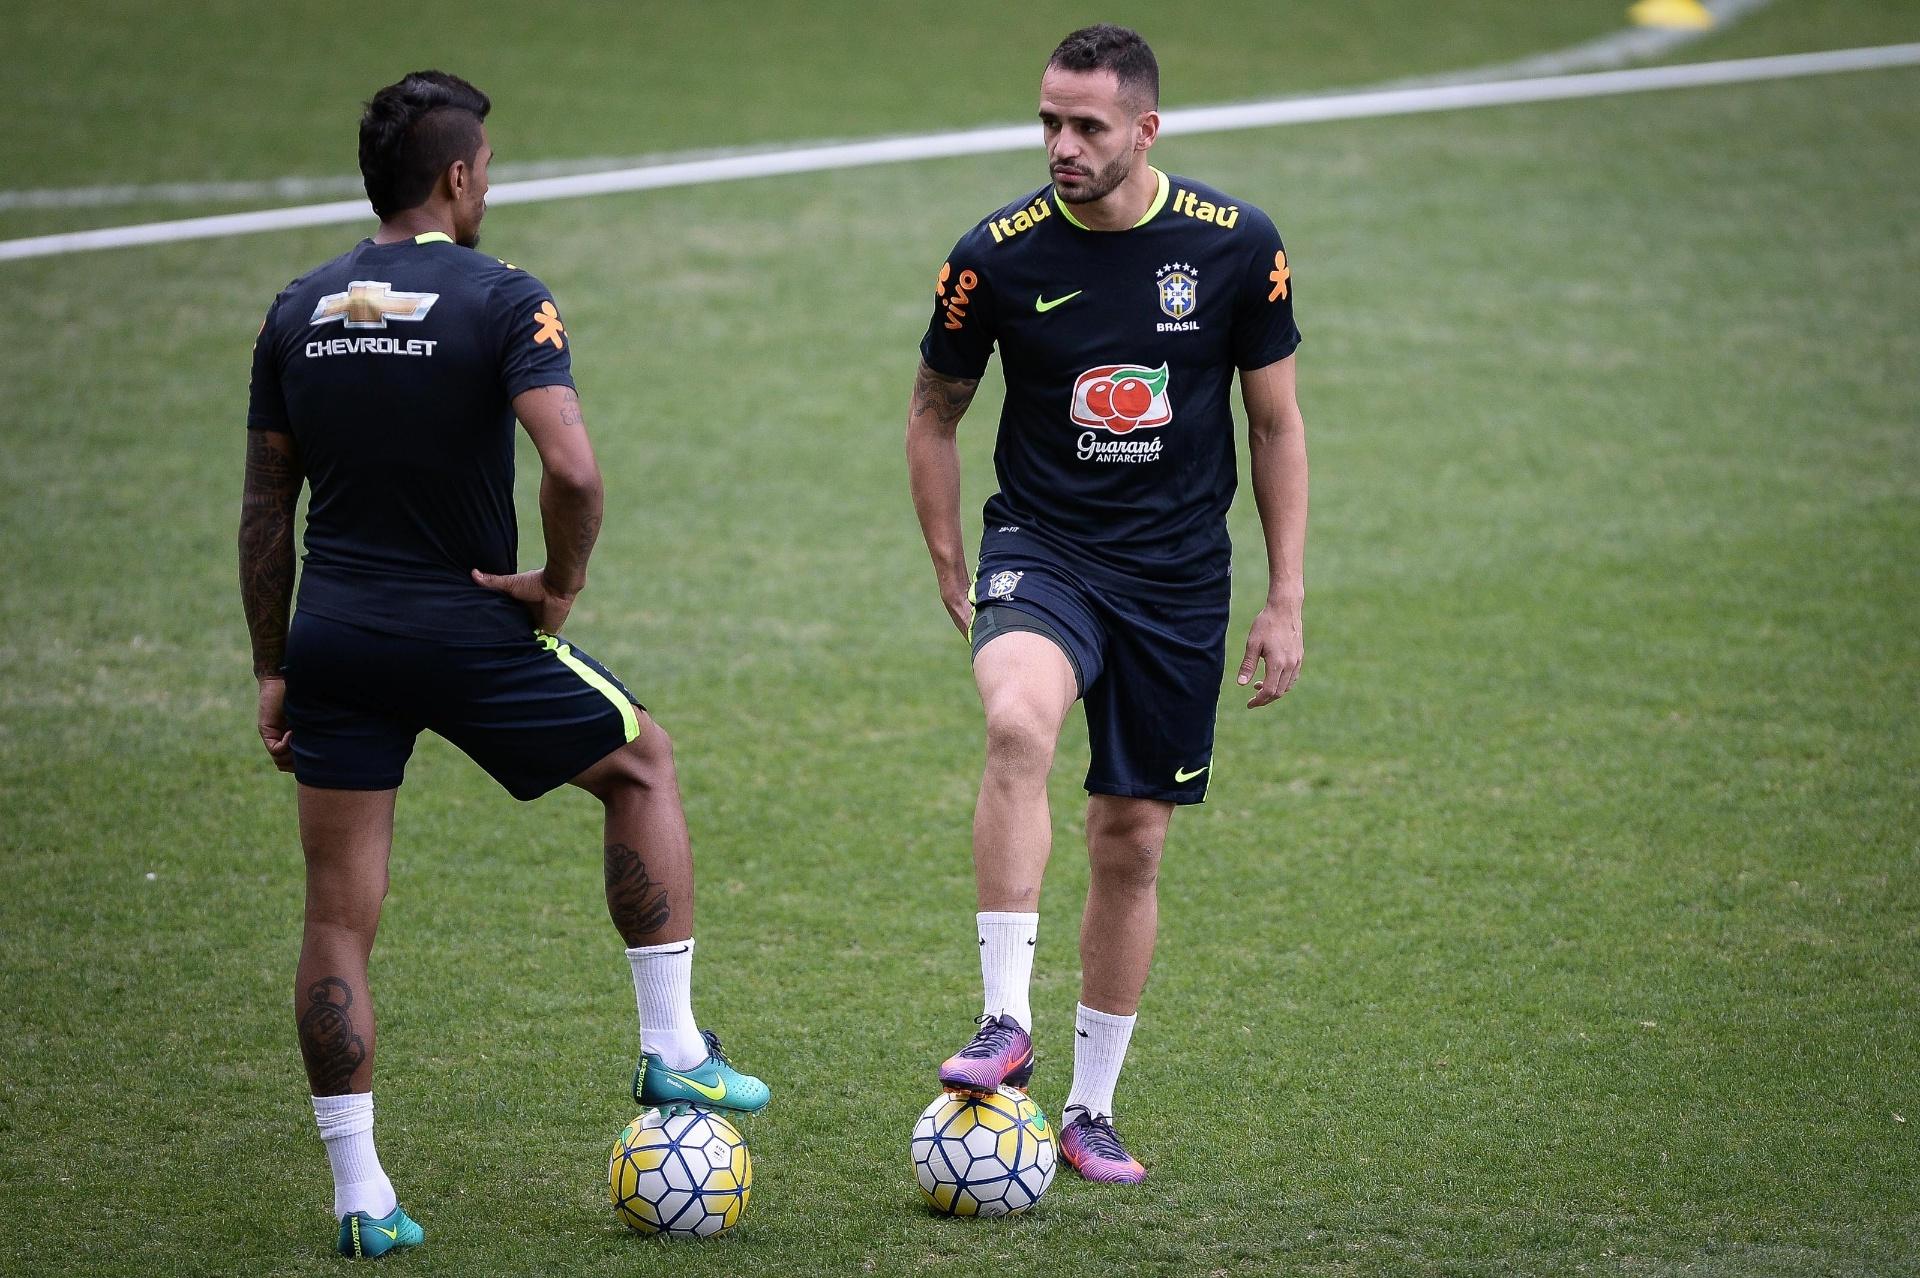 Renato Augusto agradece Dunga e lembra conversa com Neymar na Olimpíada -  19 03 2017 - UOL Esporte 0dda981c9b047